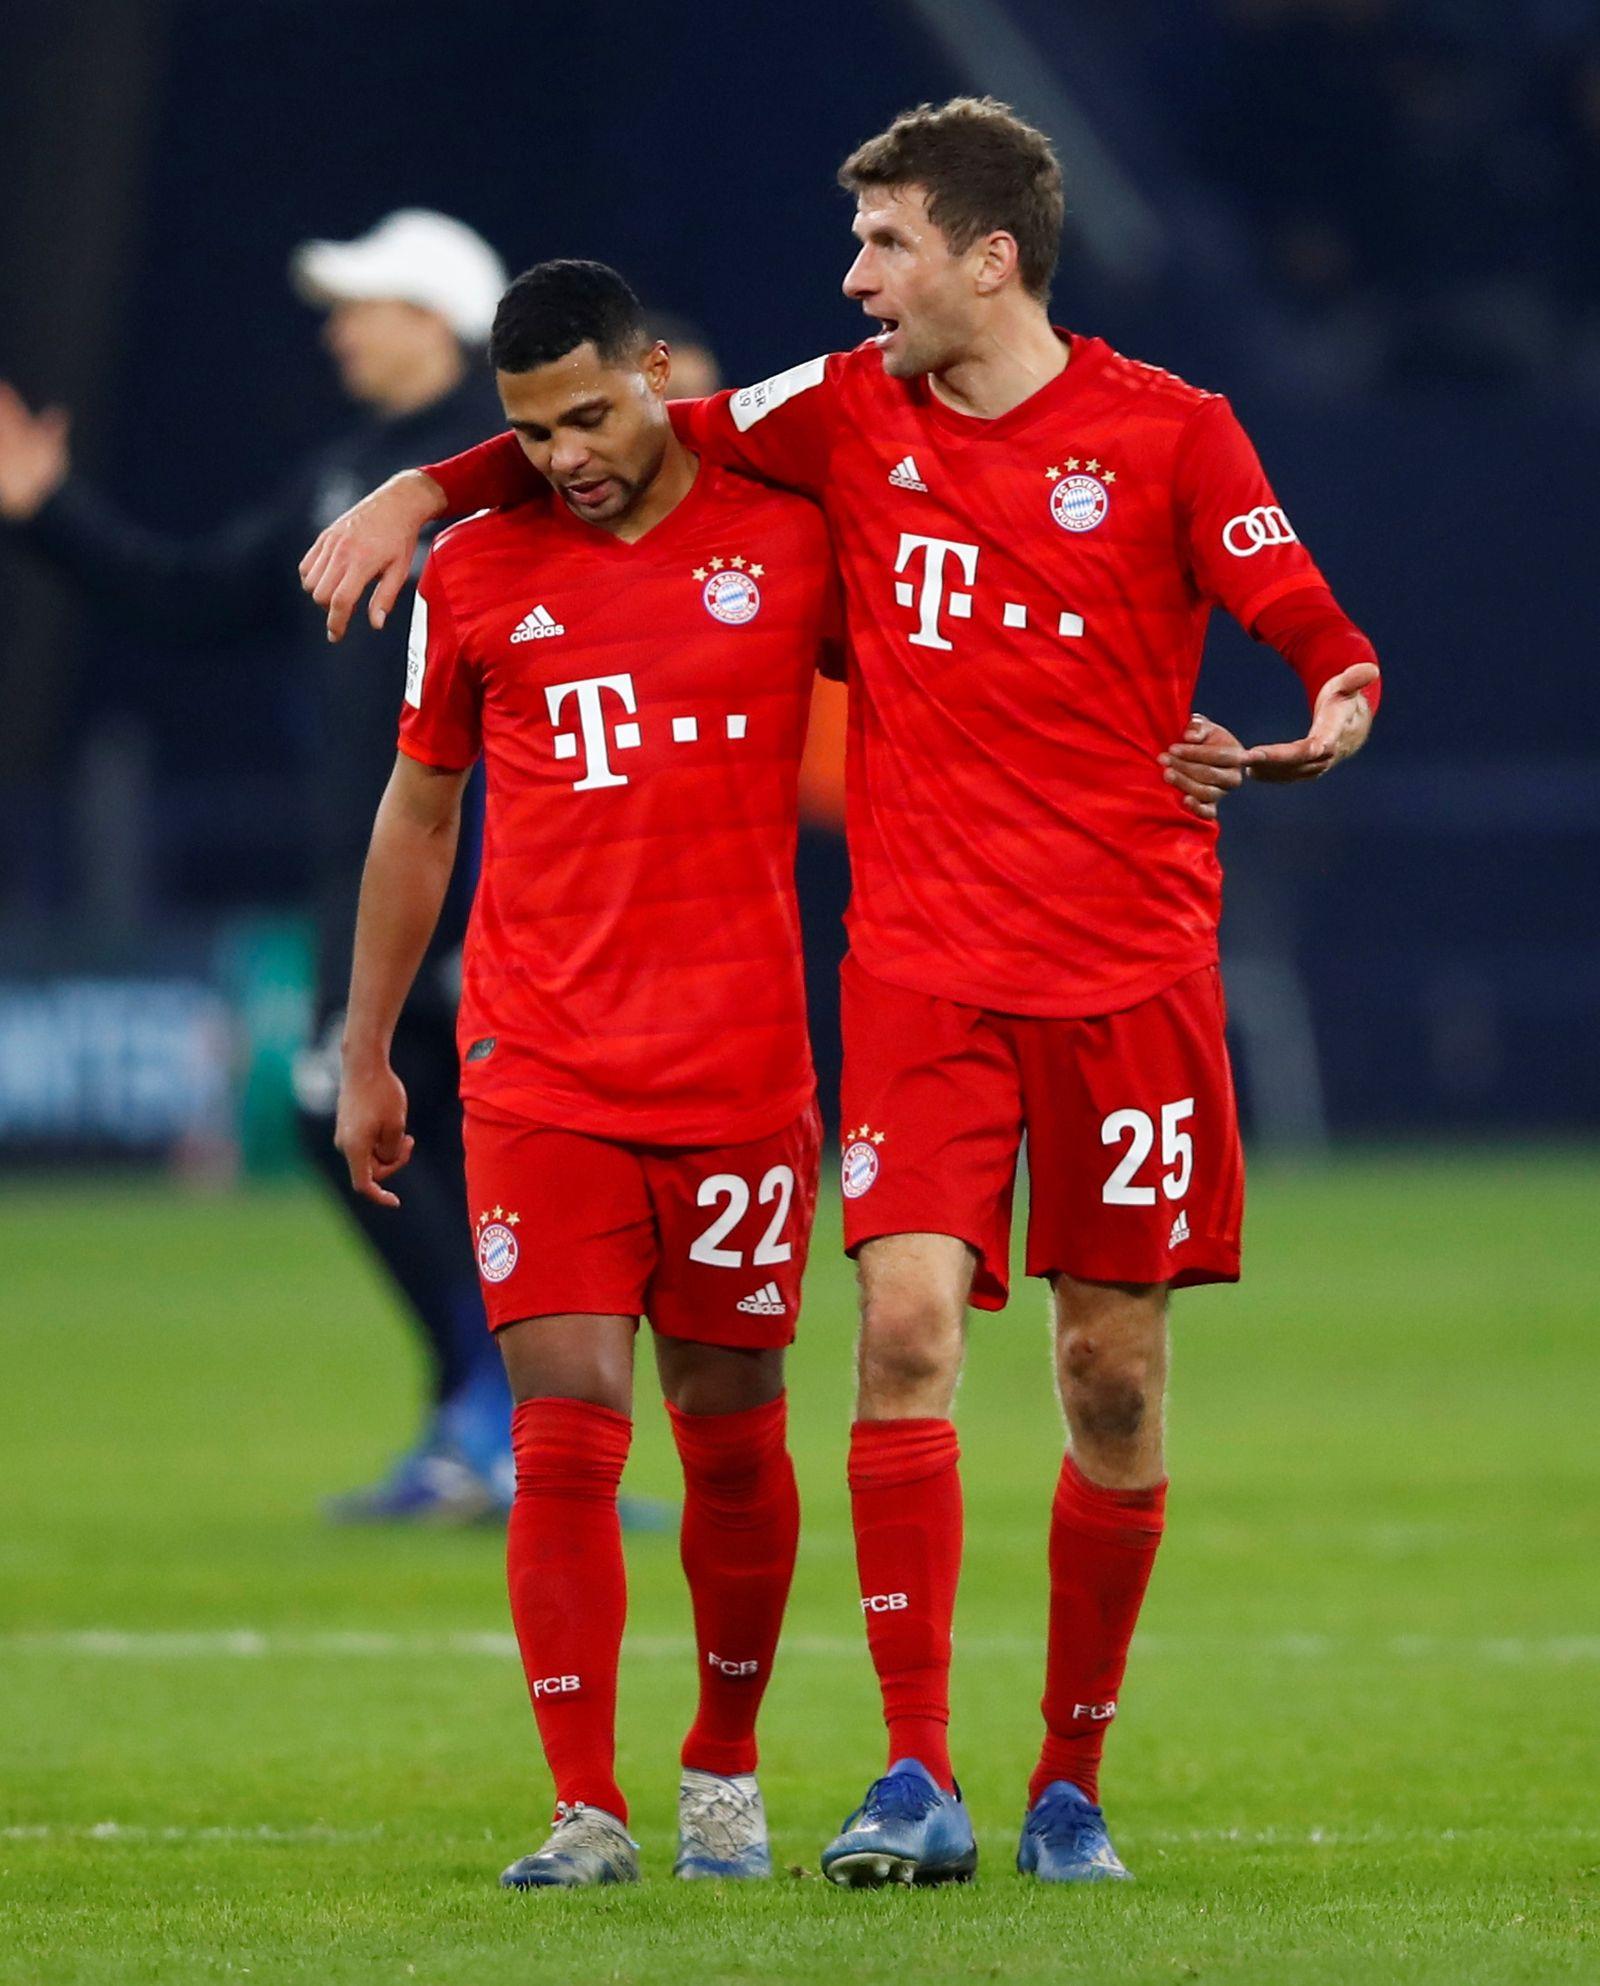 DFB Cup - Schalke 04 v Bayern Munich